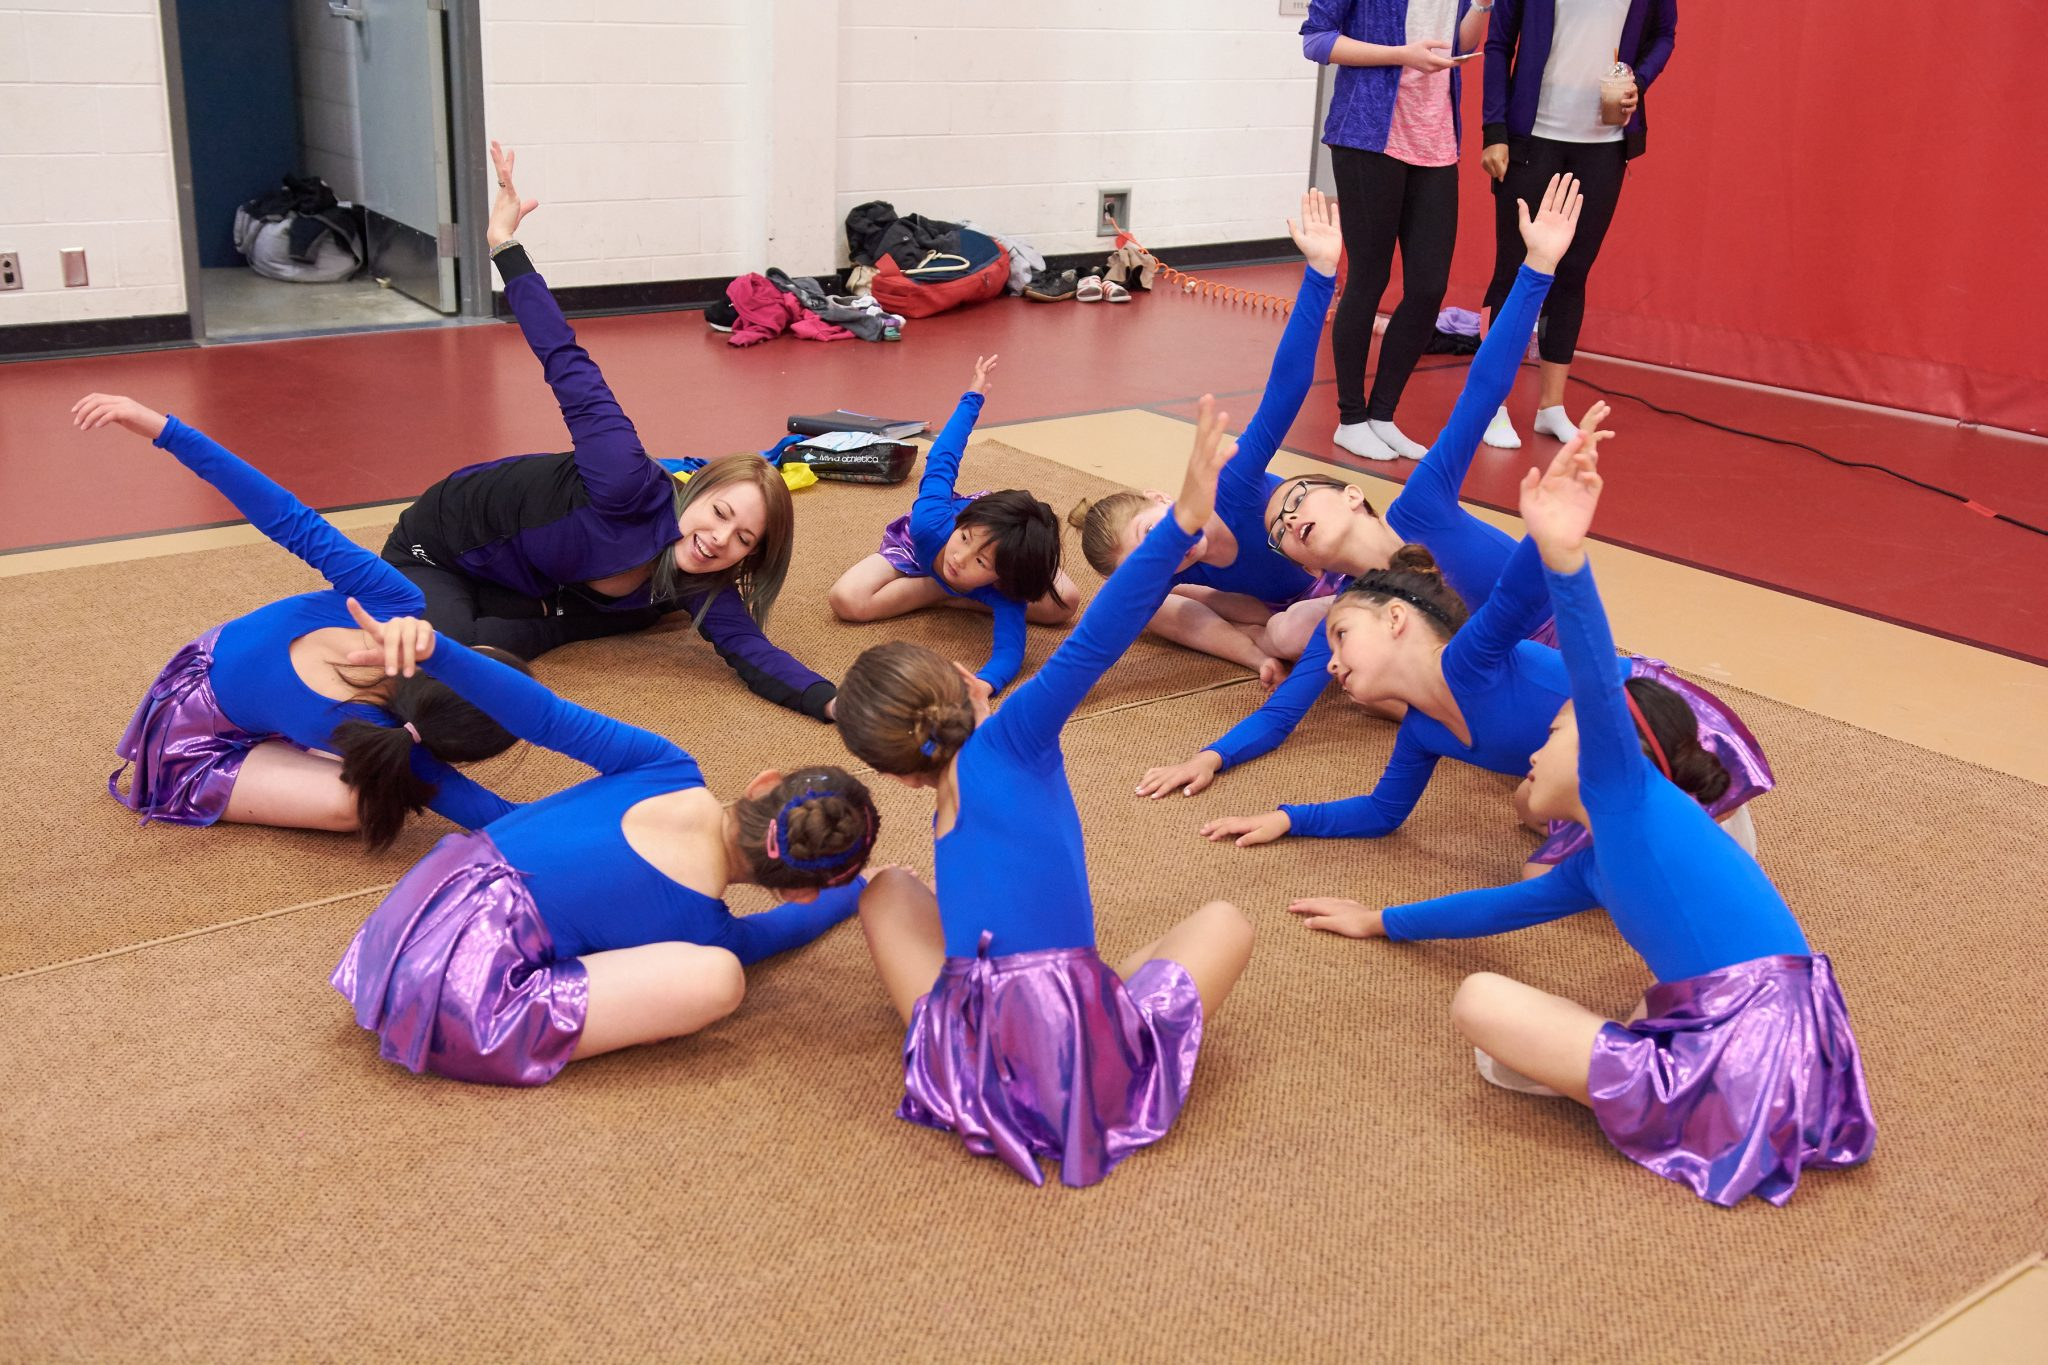 Elena's RG, Edmonton, Recreational, Gymnastics, Registration